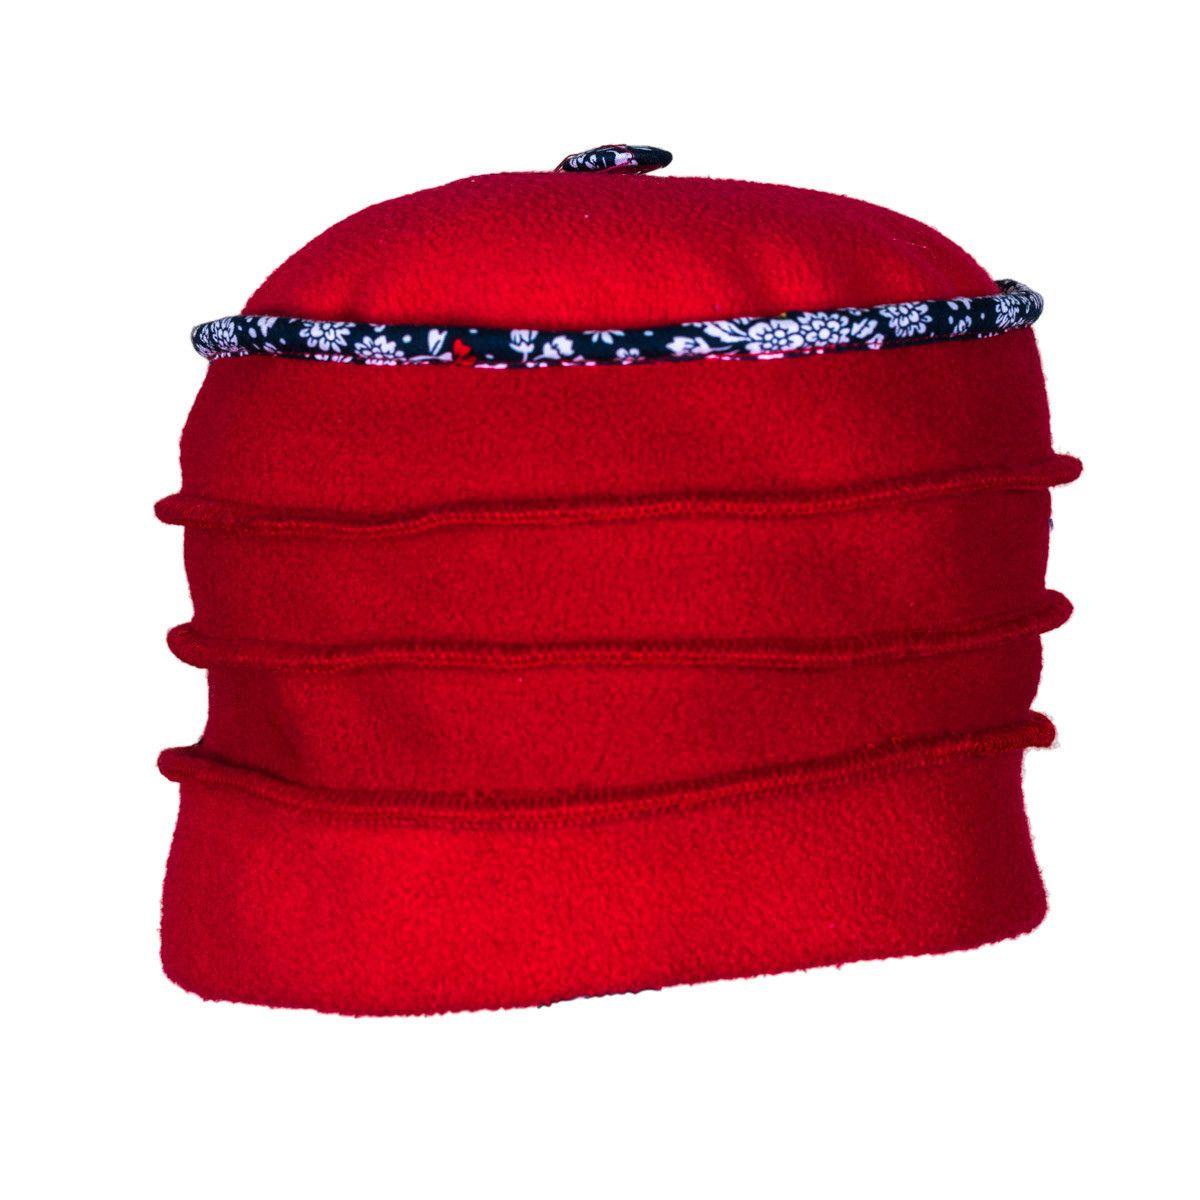 Bonnet polaire Red berry